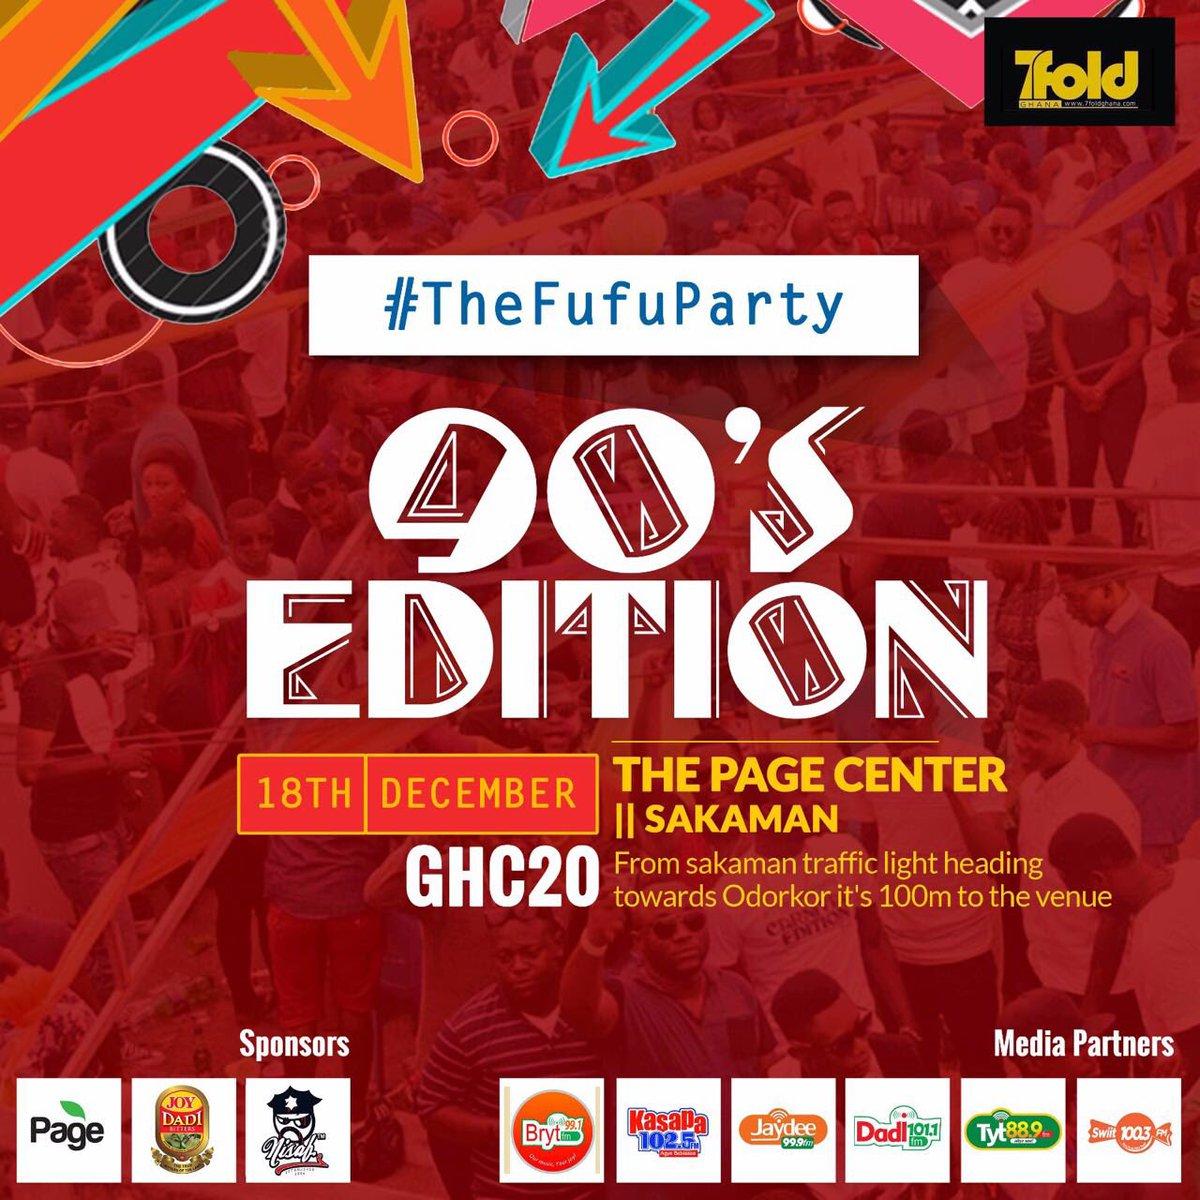 @7foldghana #TheFuFuParty @7foldghana #TheFuFuParty @7foldghana #TheFuFuParty Sunday @ Page Event (Sakaman) https://t.co/cHlGu4OIZu